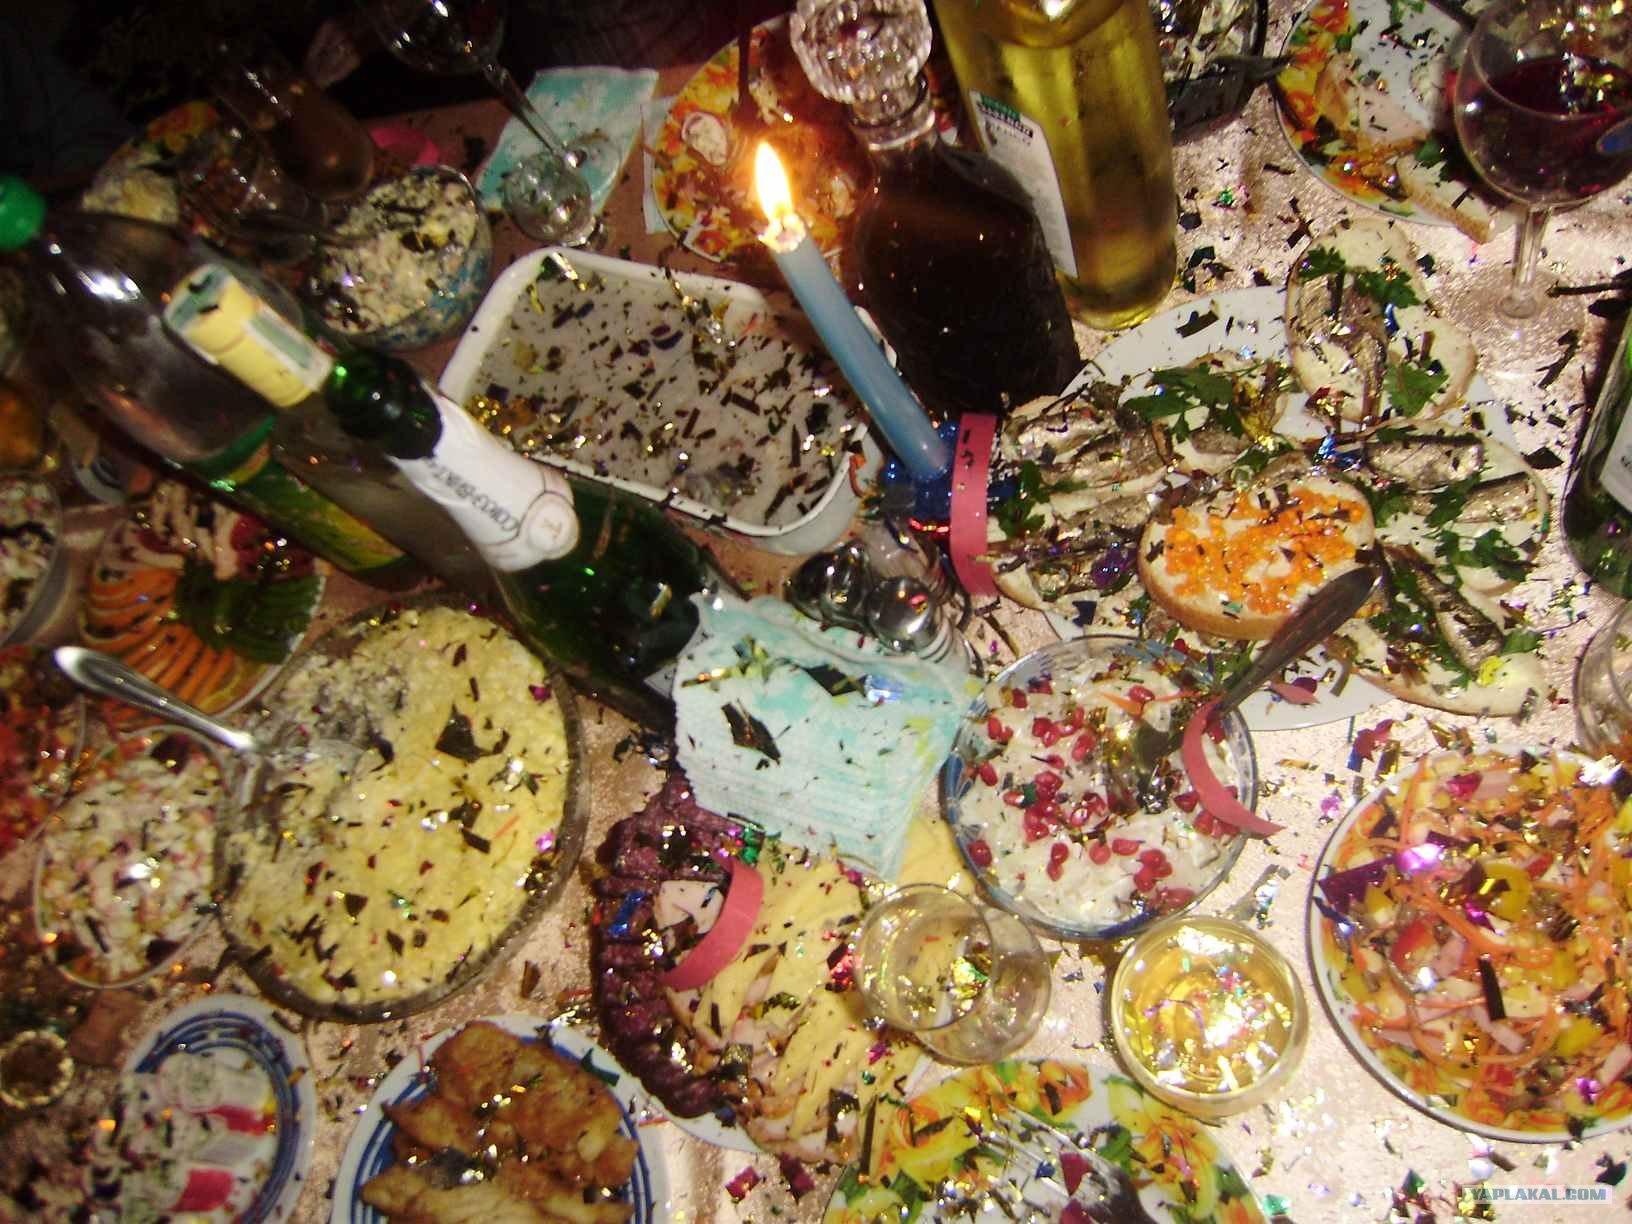 Russian New Year Feast And Confetti Petard Fail Russia Travel Blog